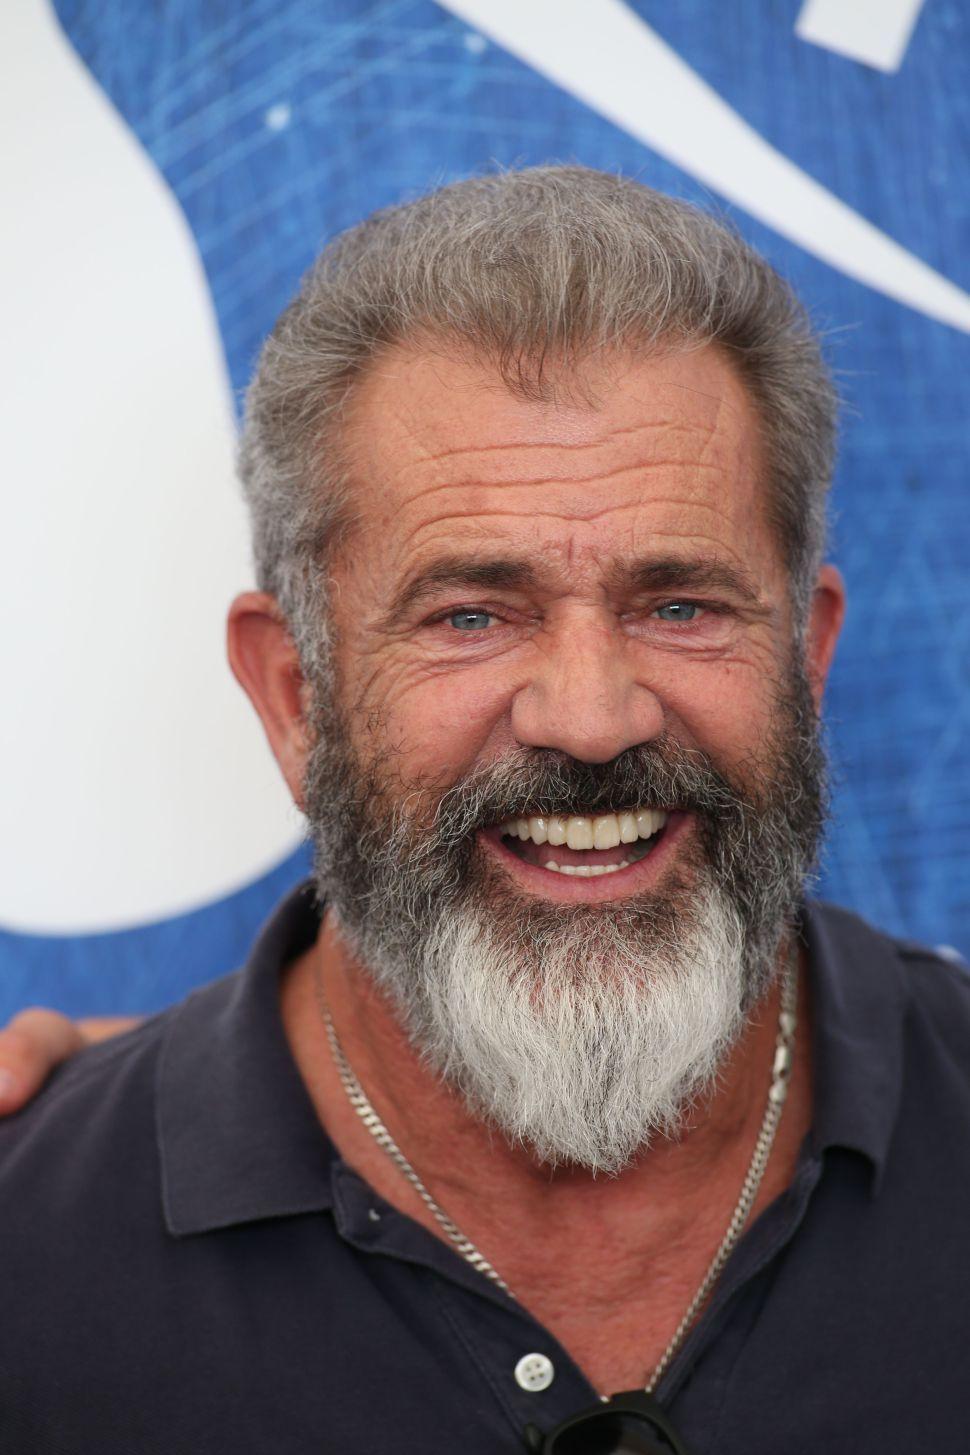 Mel Gibson long beard style